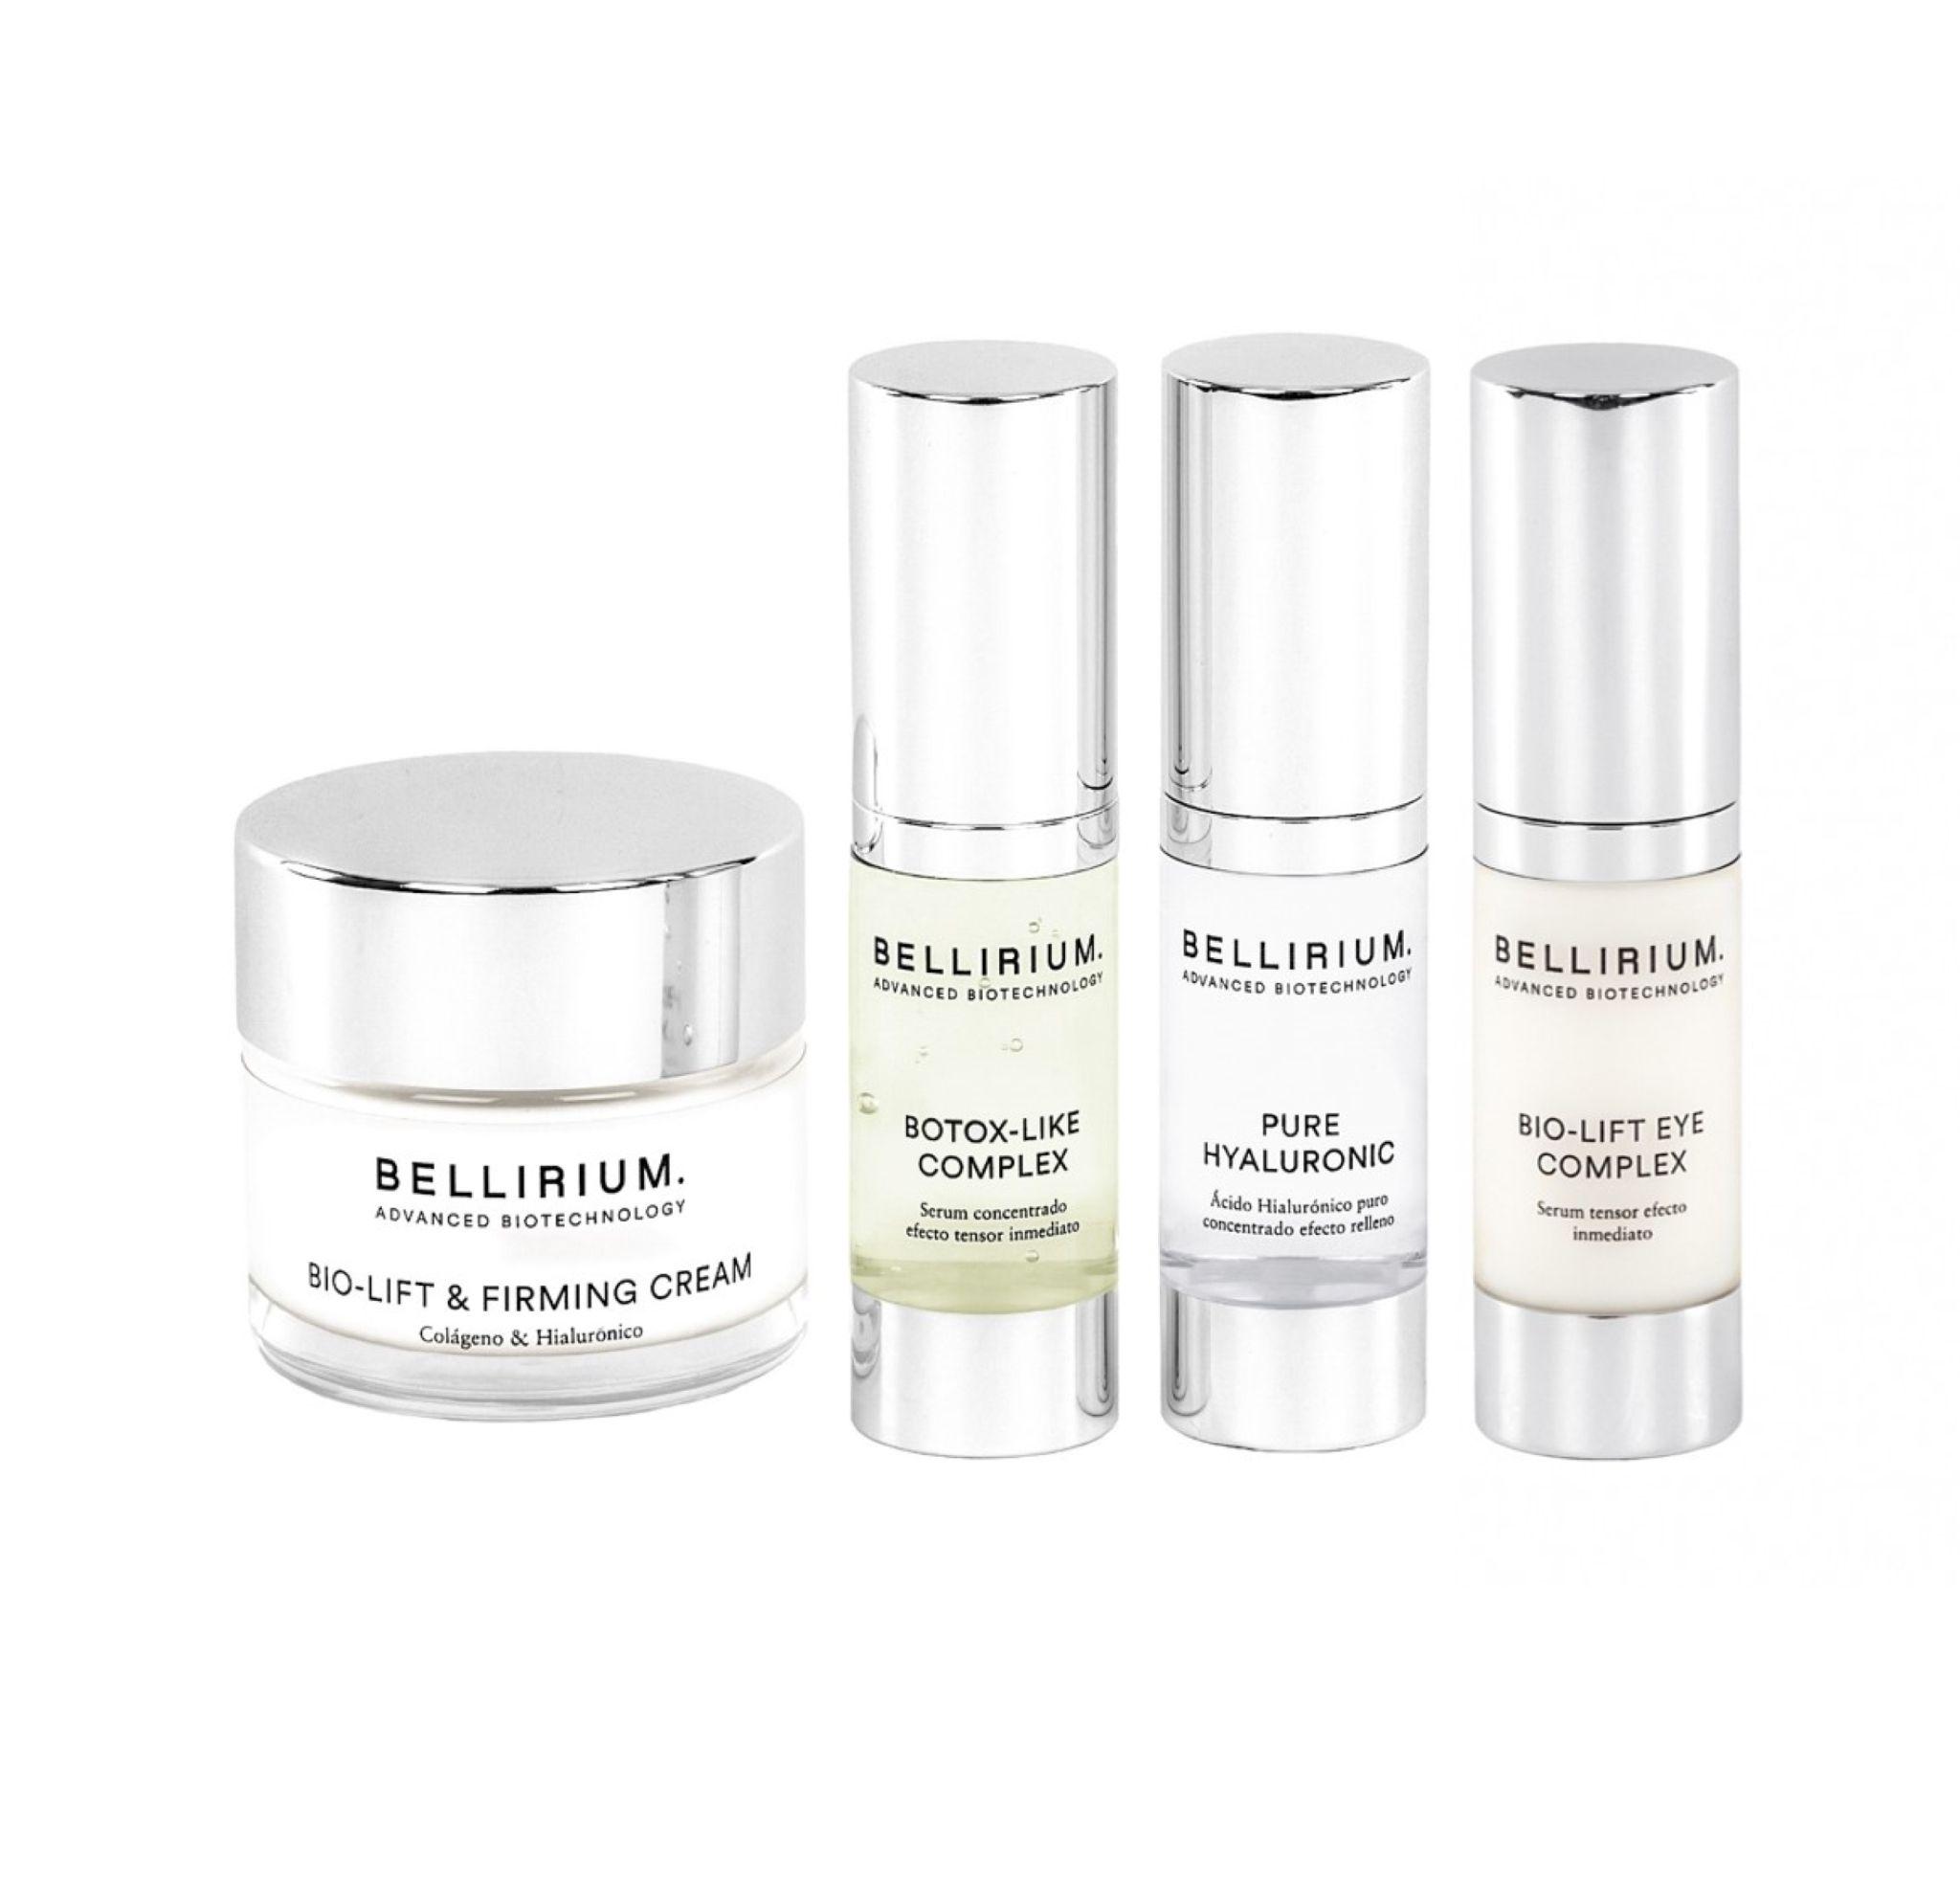 BELLIRIUM-Bodegon1-MAXIMACALIDAD 2